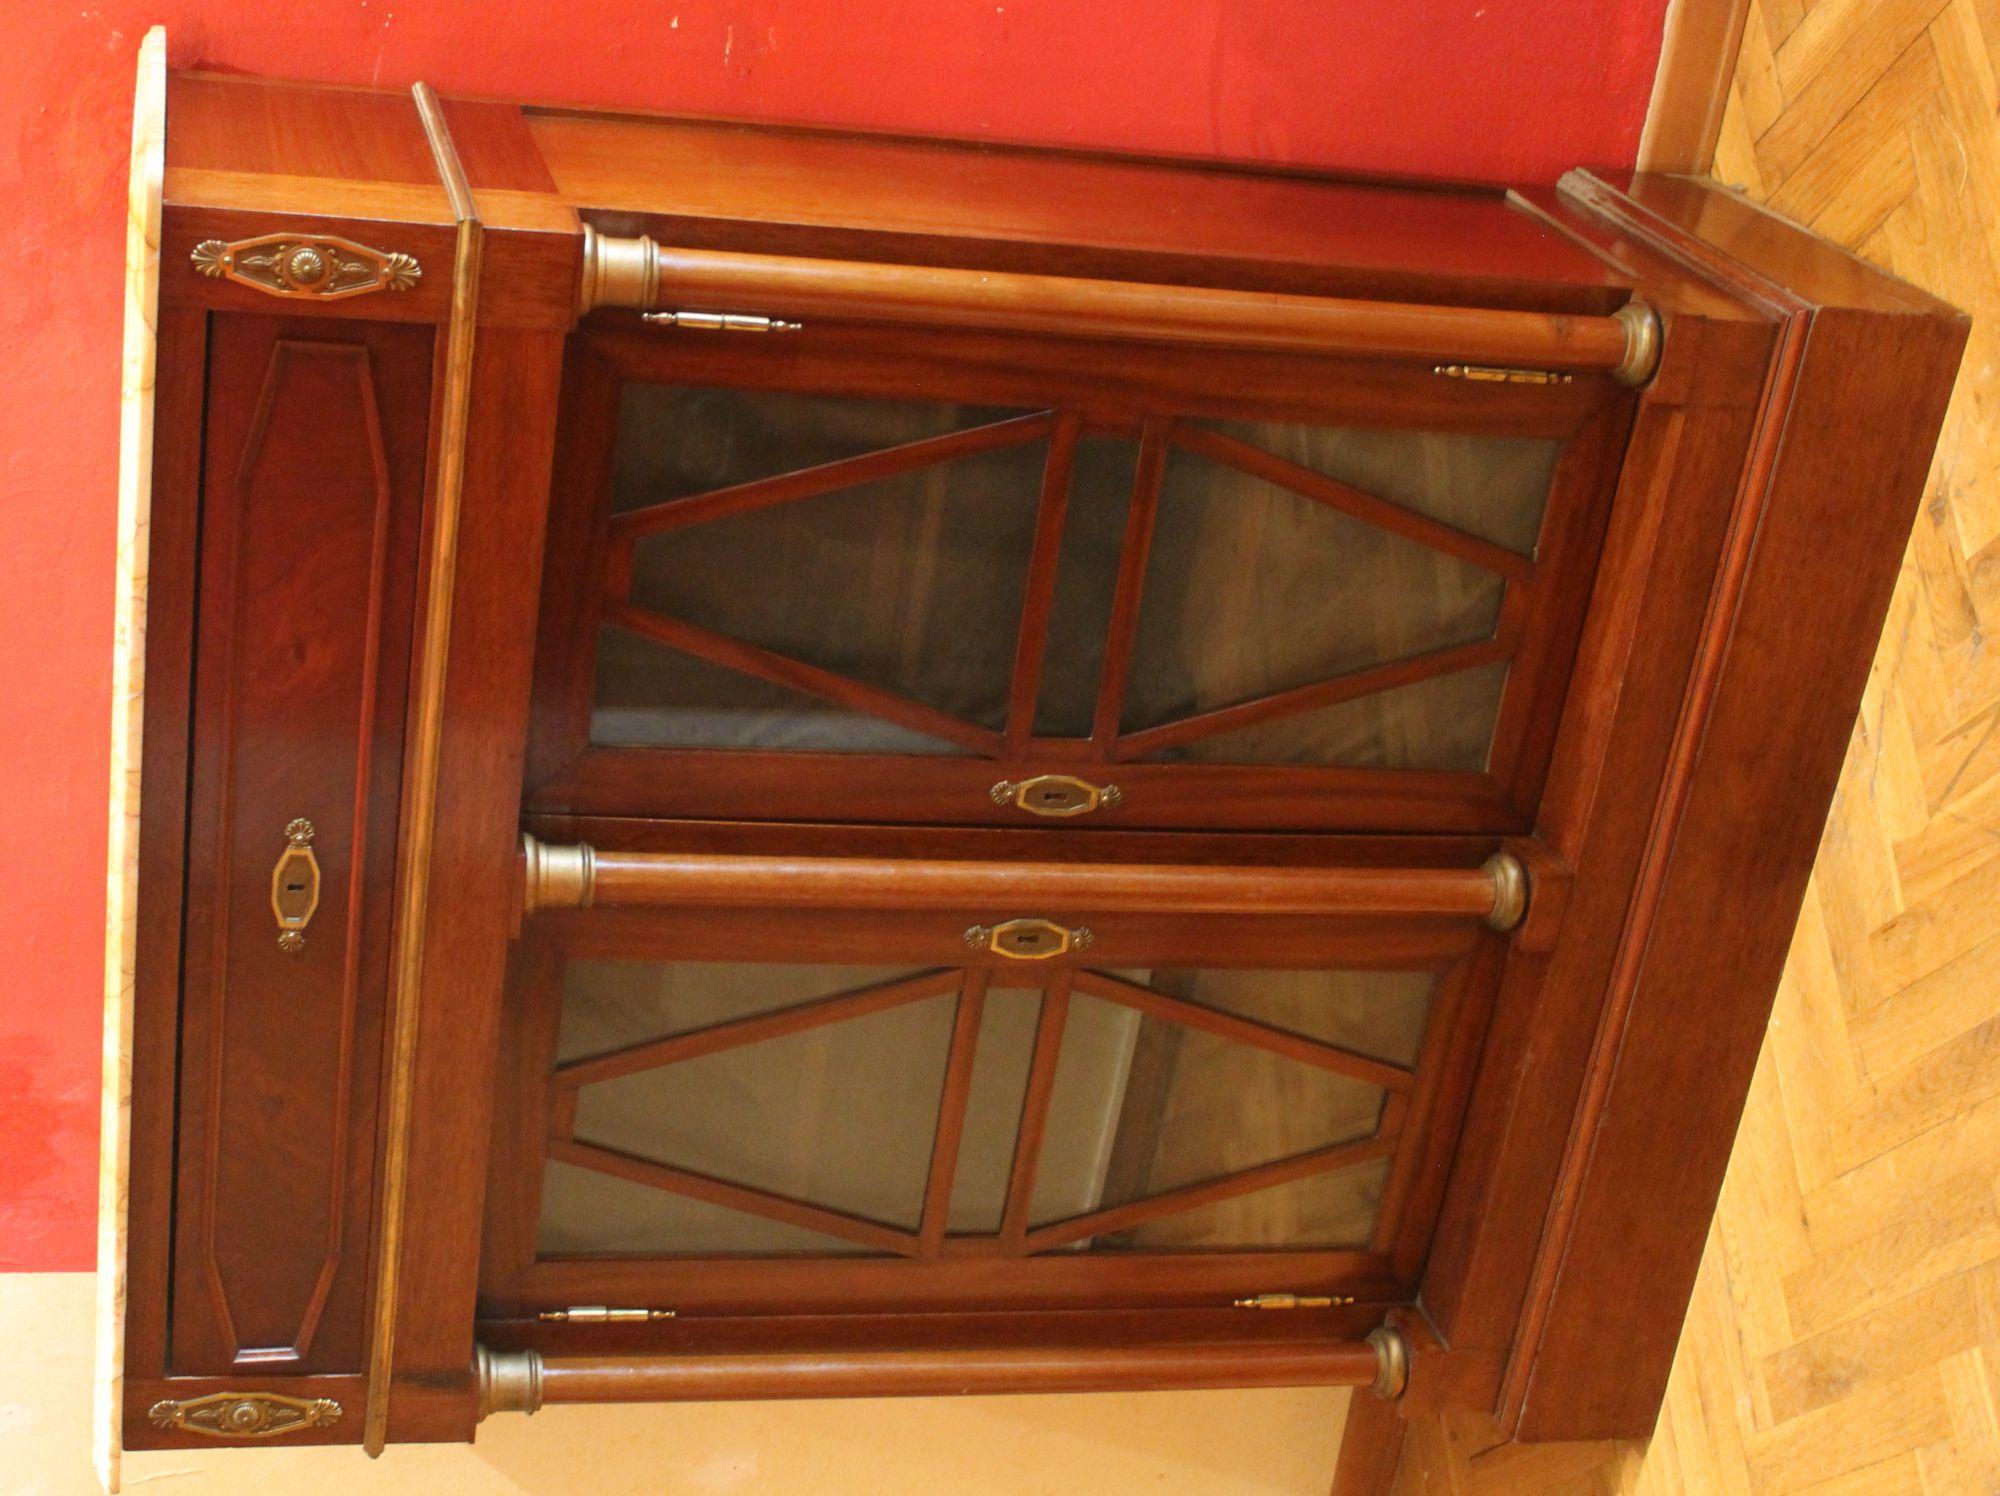 19th Century Mahogany Bookcase Or Vitrine Cabinet With